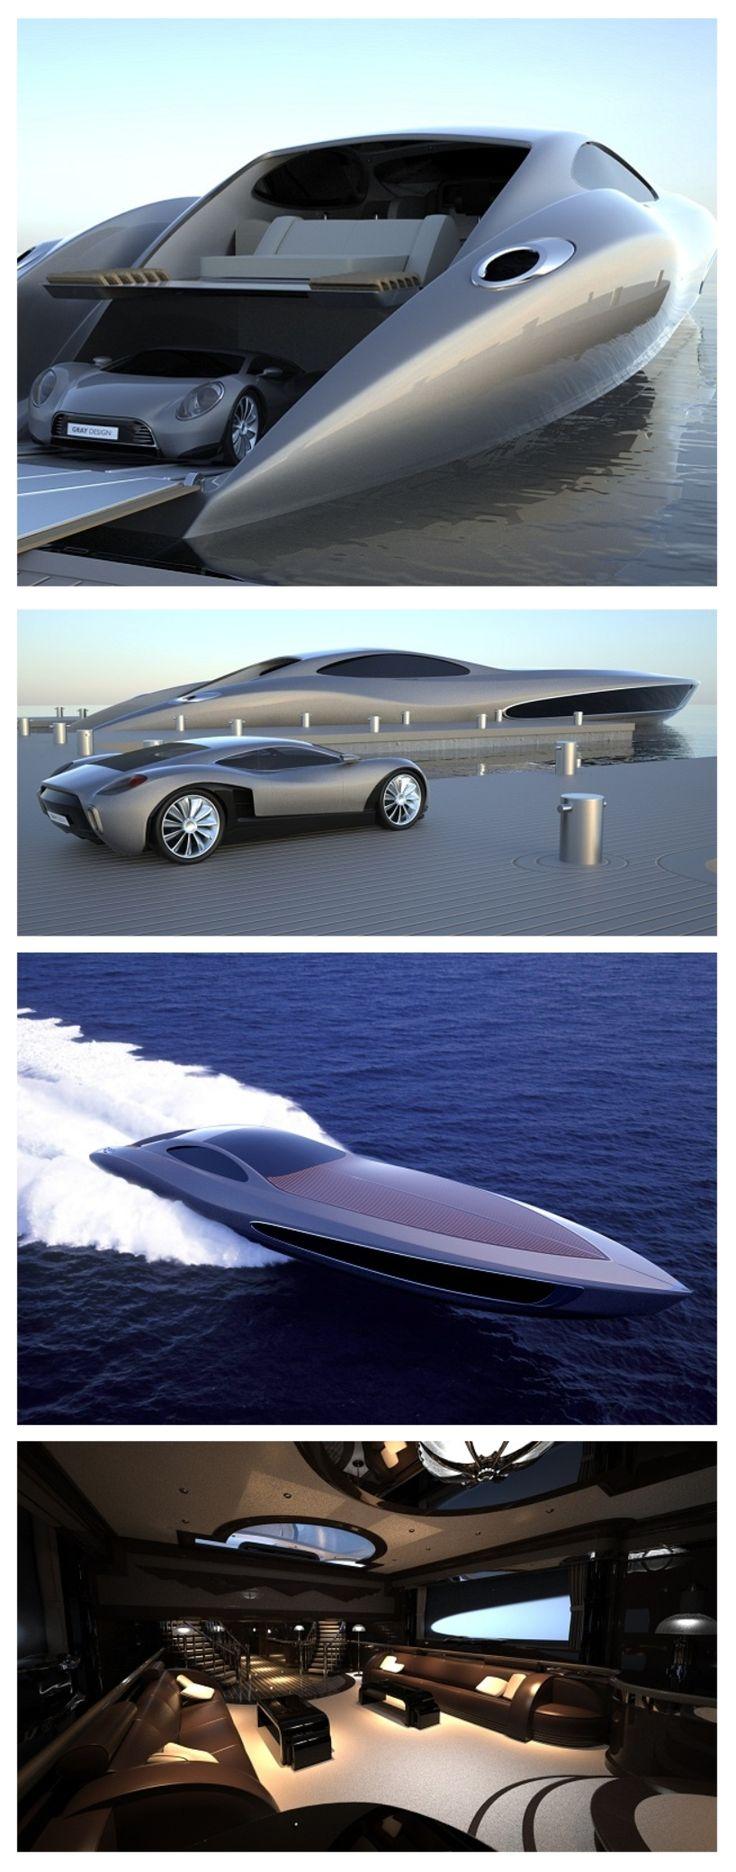 Iate ultra luxuoso que já vem com carro ultra exclusivo de brinde.